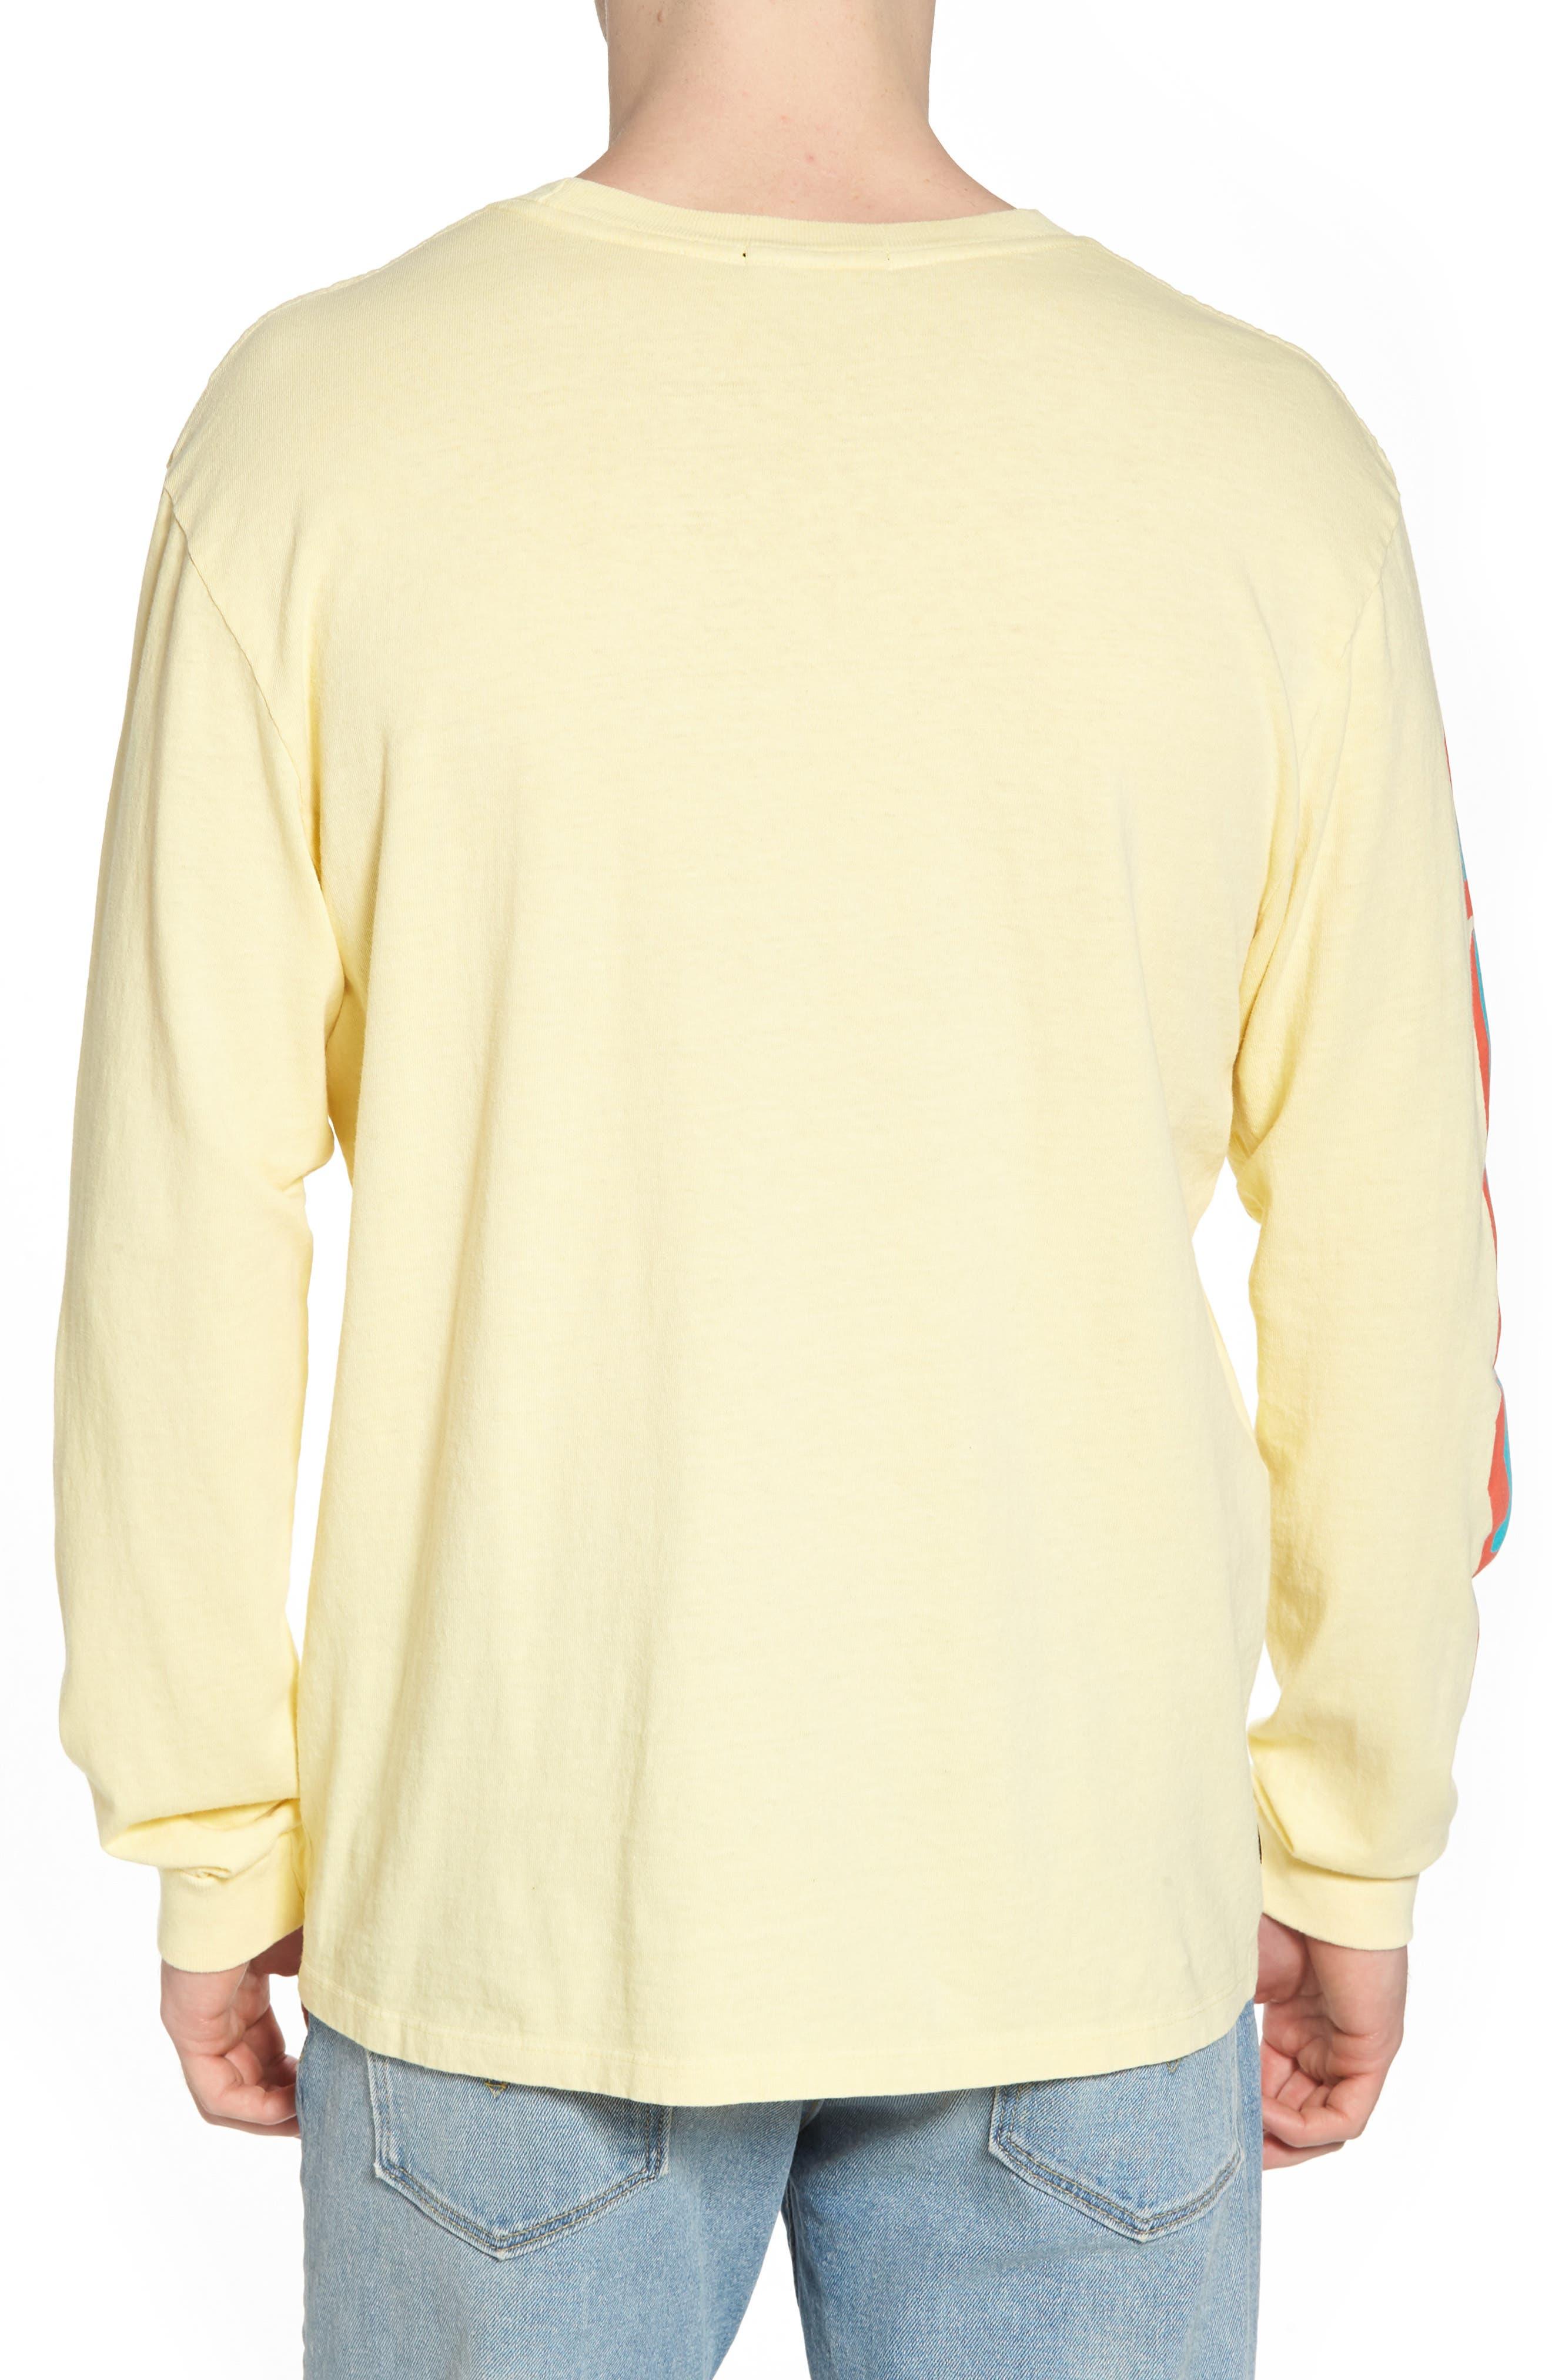 New World II Pigment T-Shirt,                             Alternate thumbnail 2, color,                             Dusty Lemon